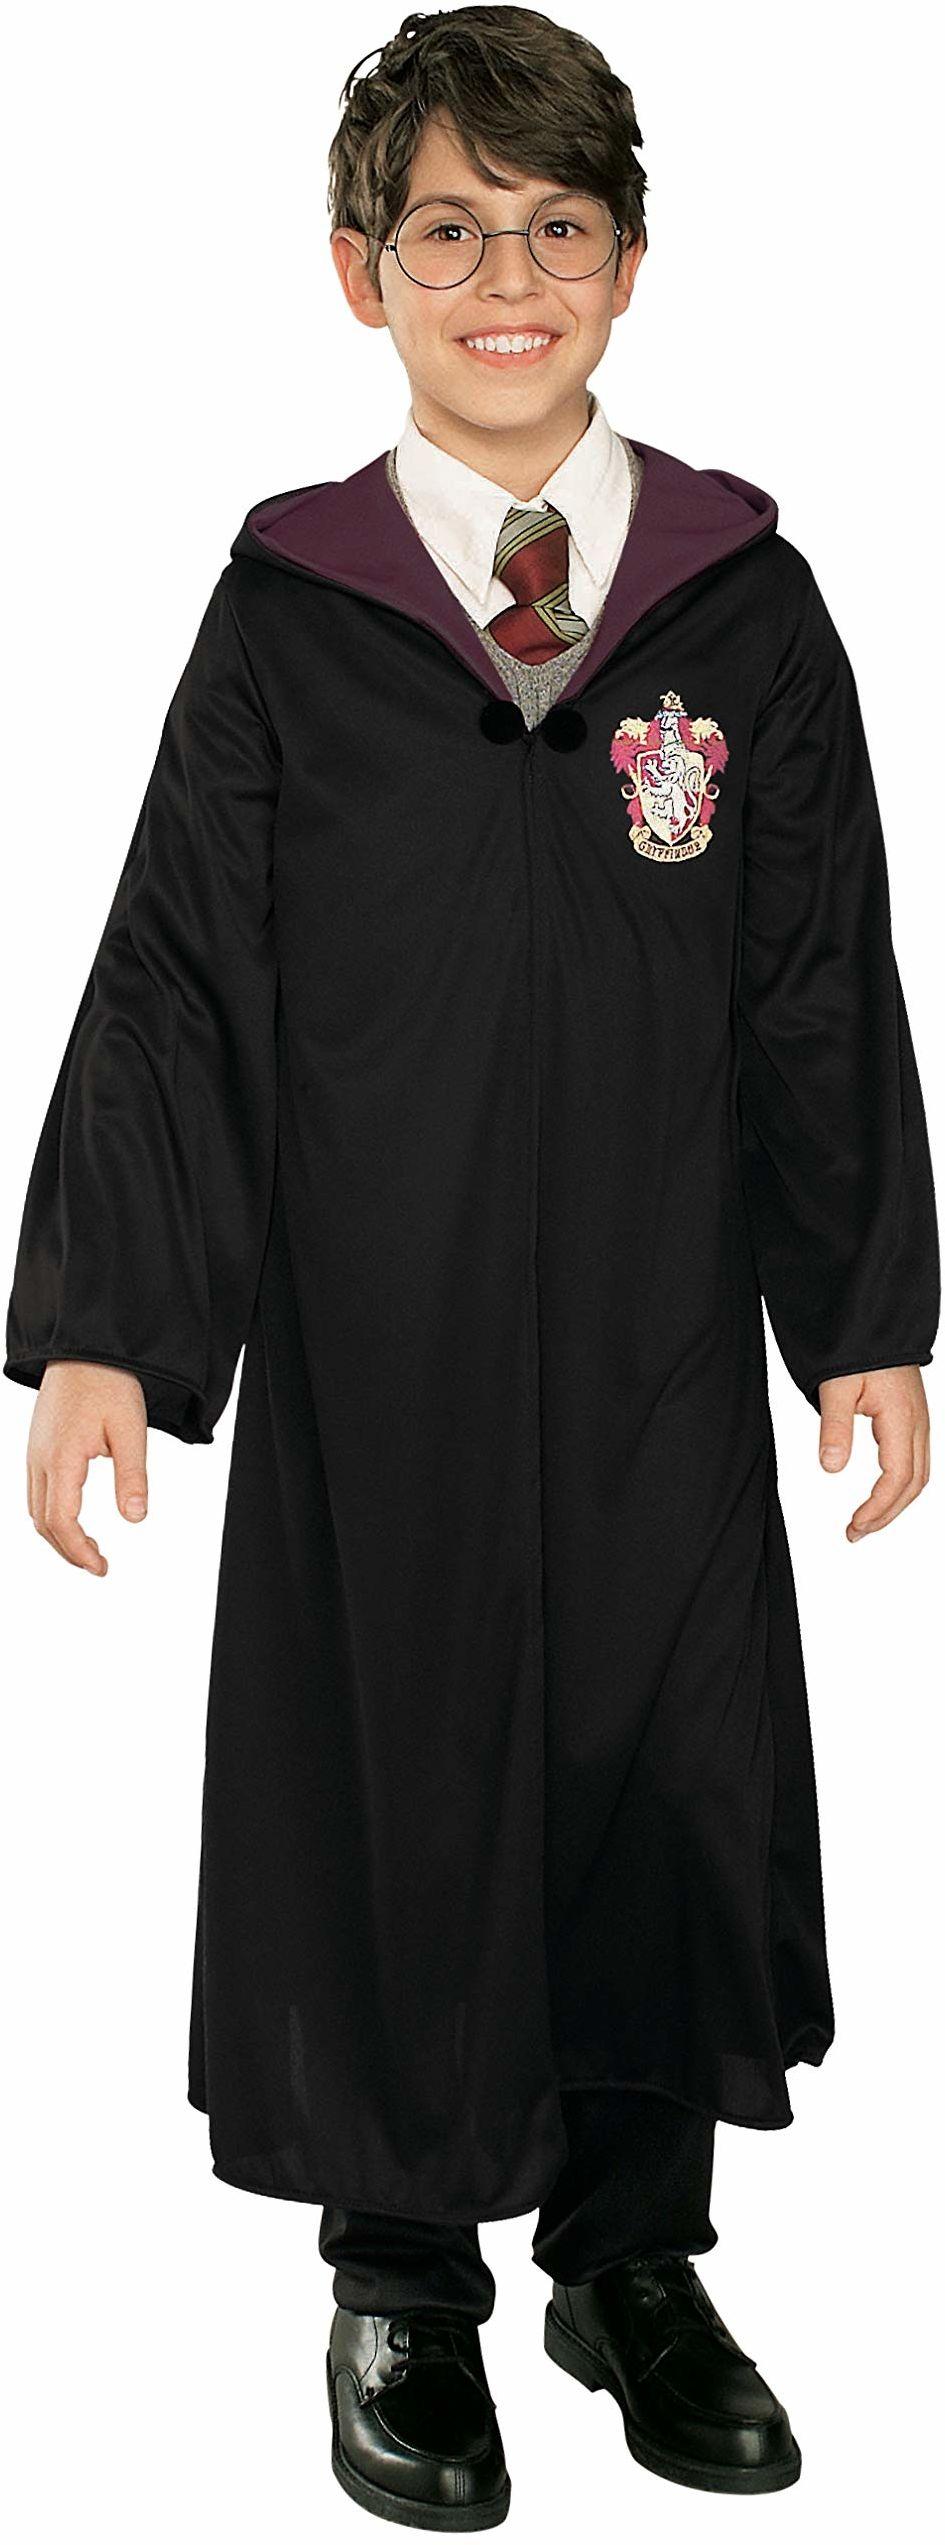 Rubie''s 884252 - Harry Potter Robe rozmiar L